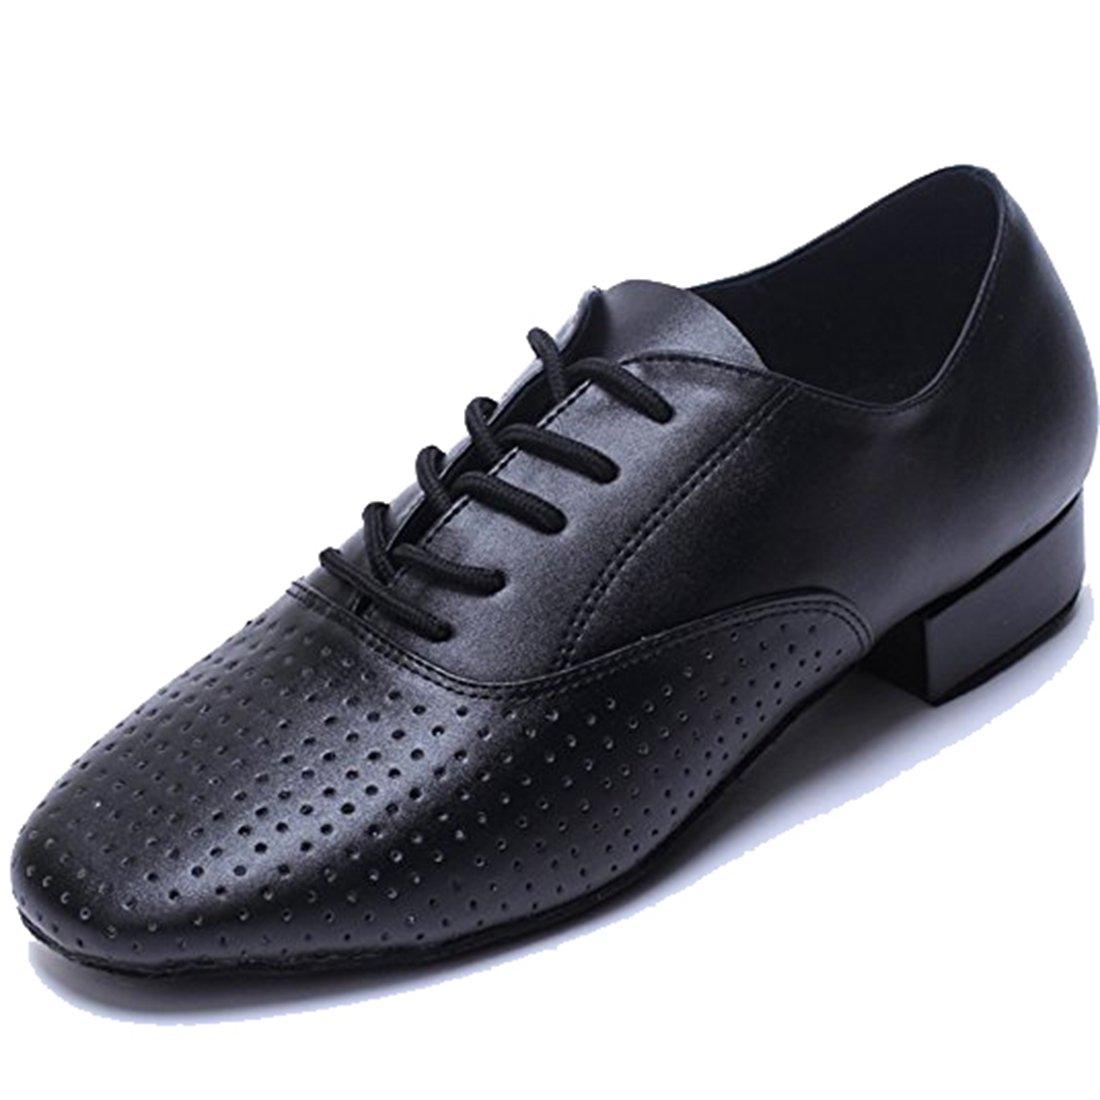 TDA Mens Poited Toe Black Leather Modern Salsa Tango Ballroom Latin Wedding Party Dance Shoes 9 M US